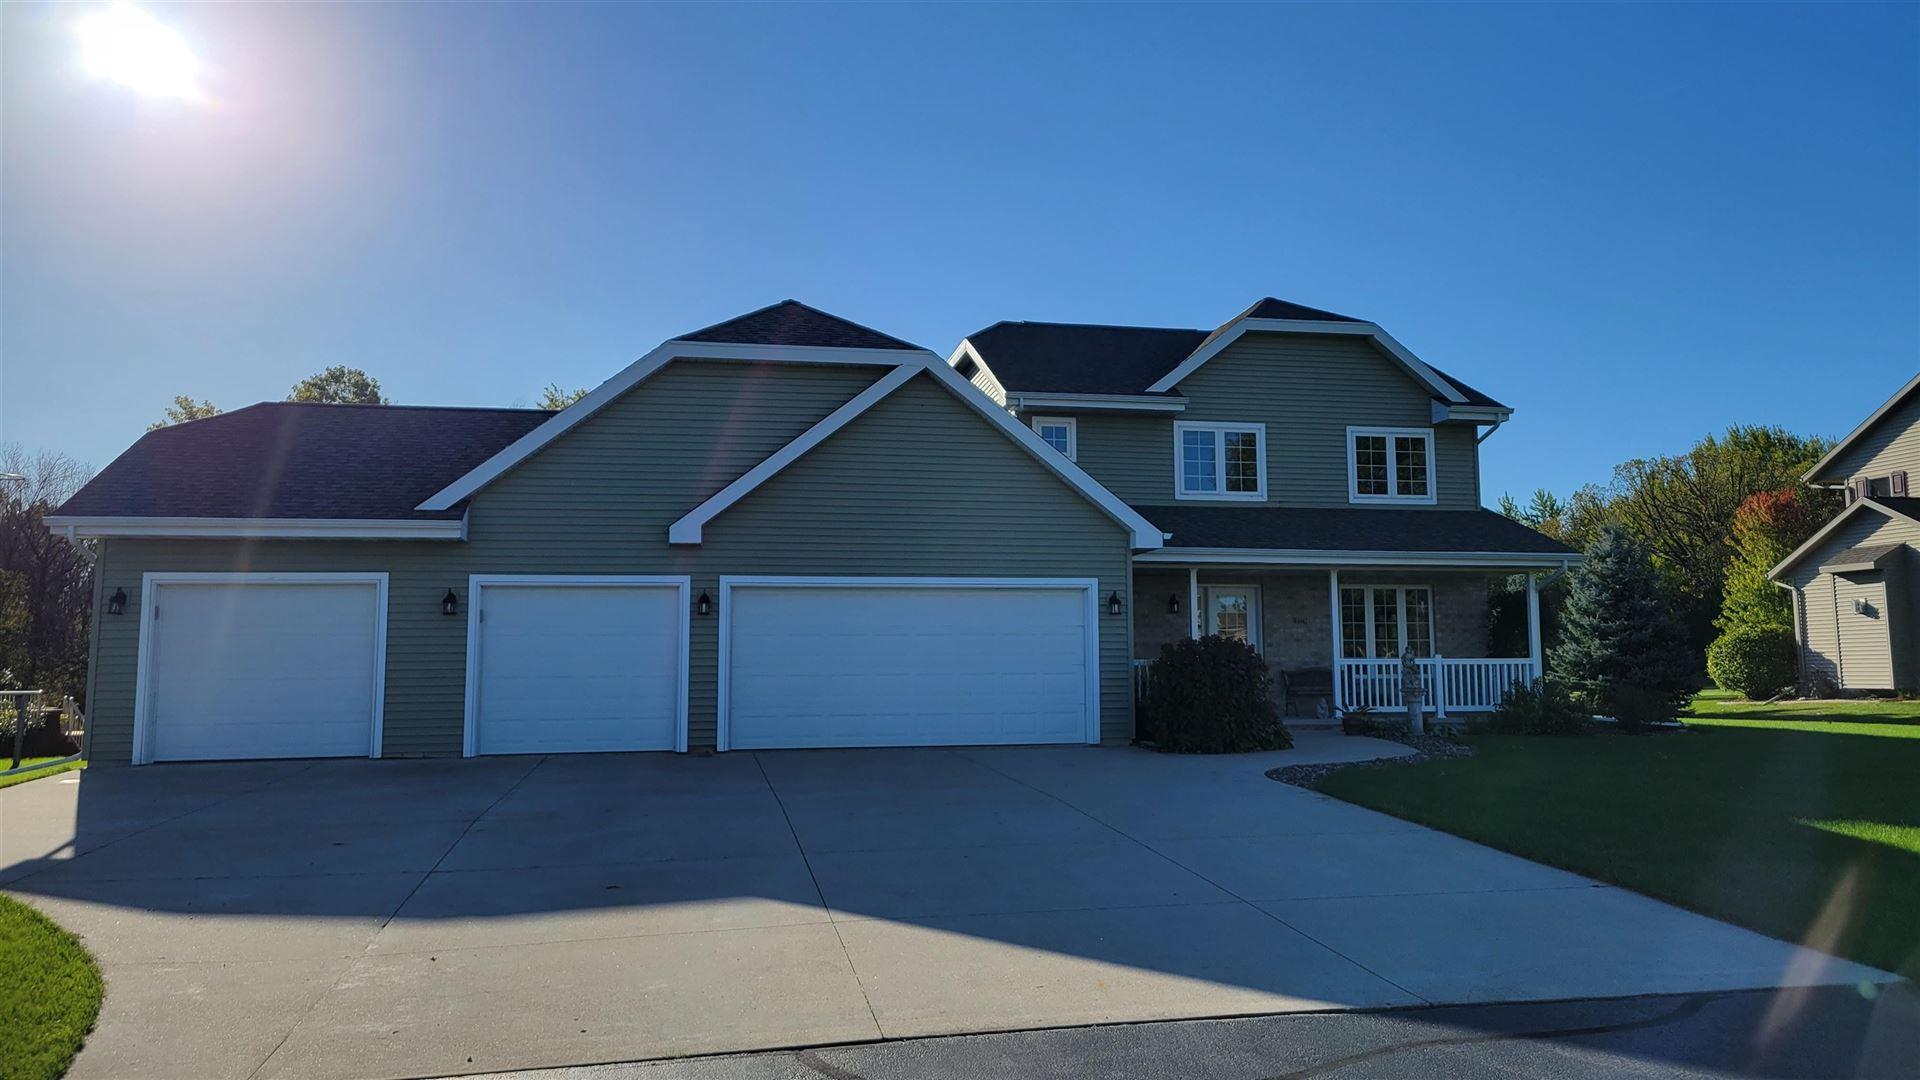 W6942 WESTWOOD Drive, Fond du Lac, WI 54937 - MLS#: 50249043